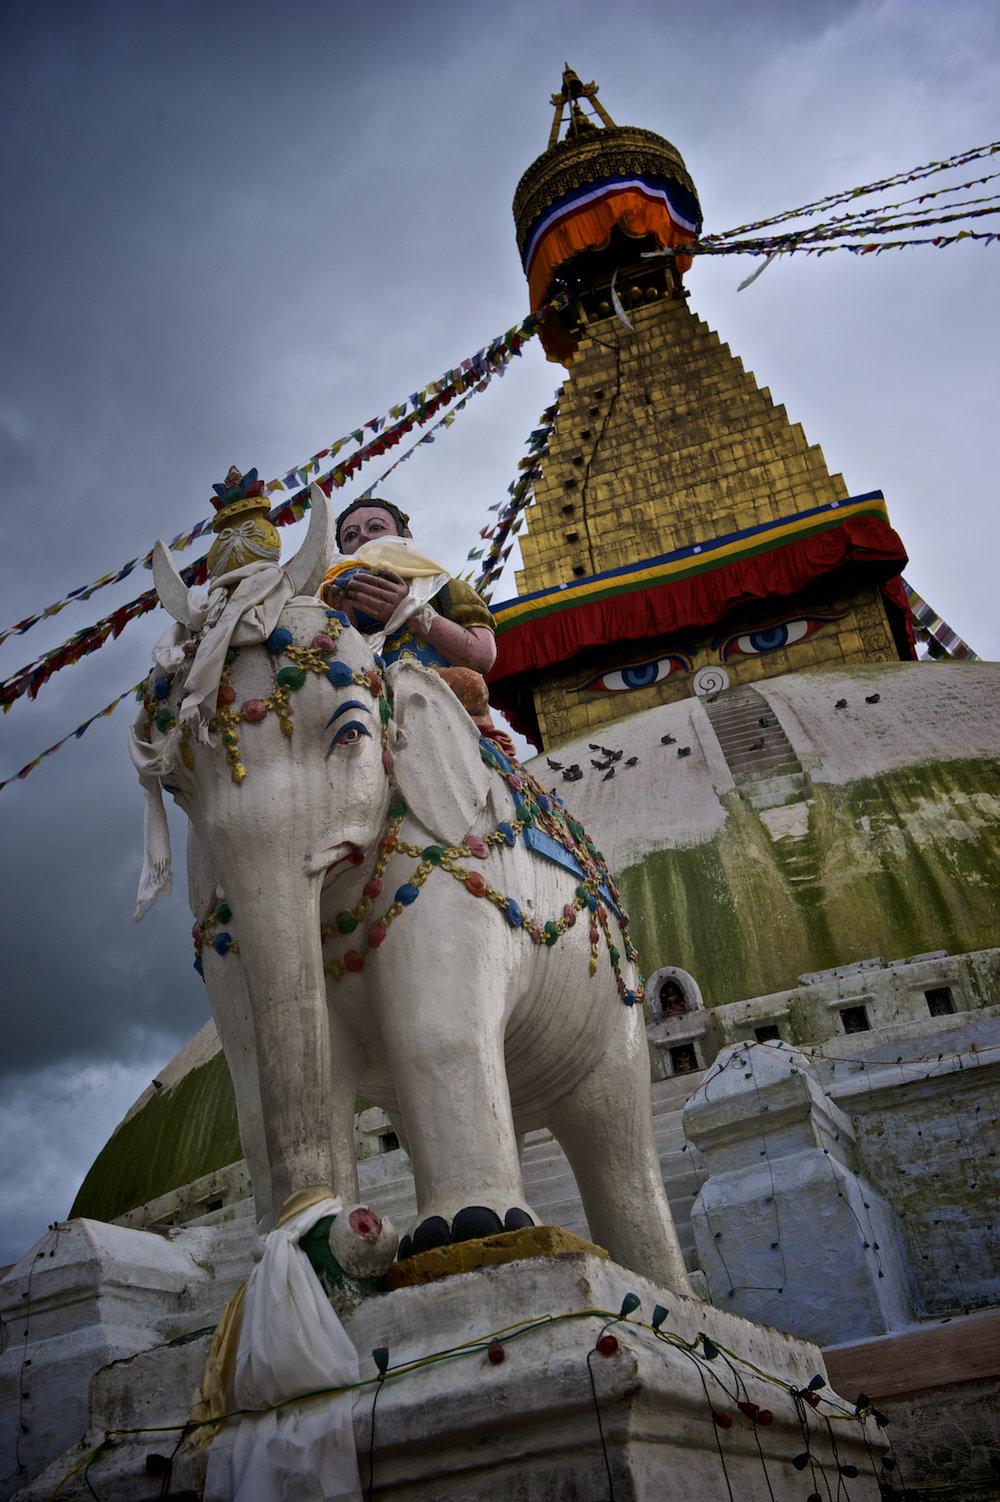 Bhoudanath Temple Stupa in Kathmandu, Nepal.  Image by New Orleans based travel photographer, Marc Pagani - marcpagani.com